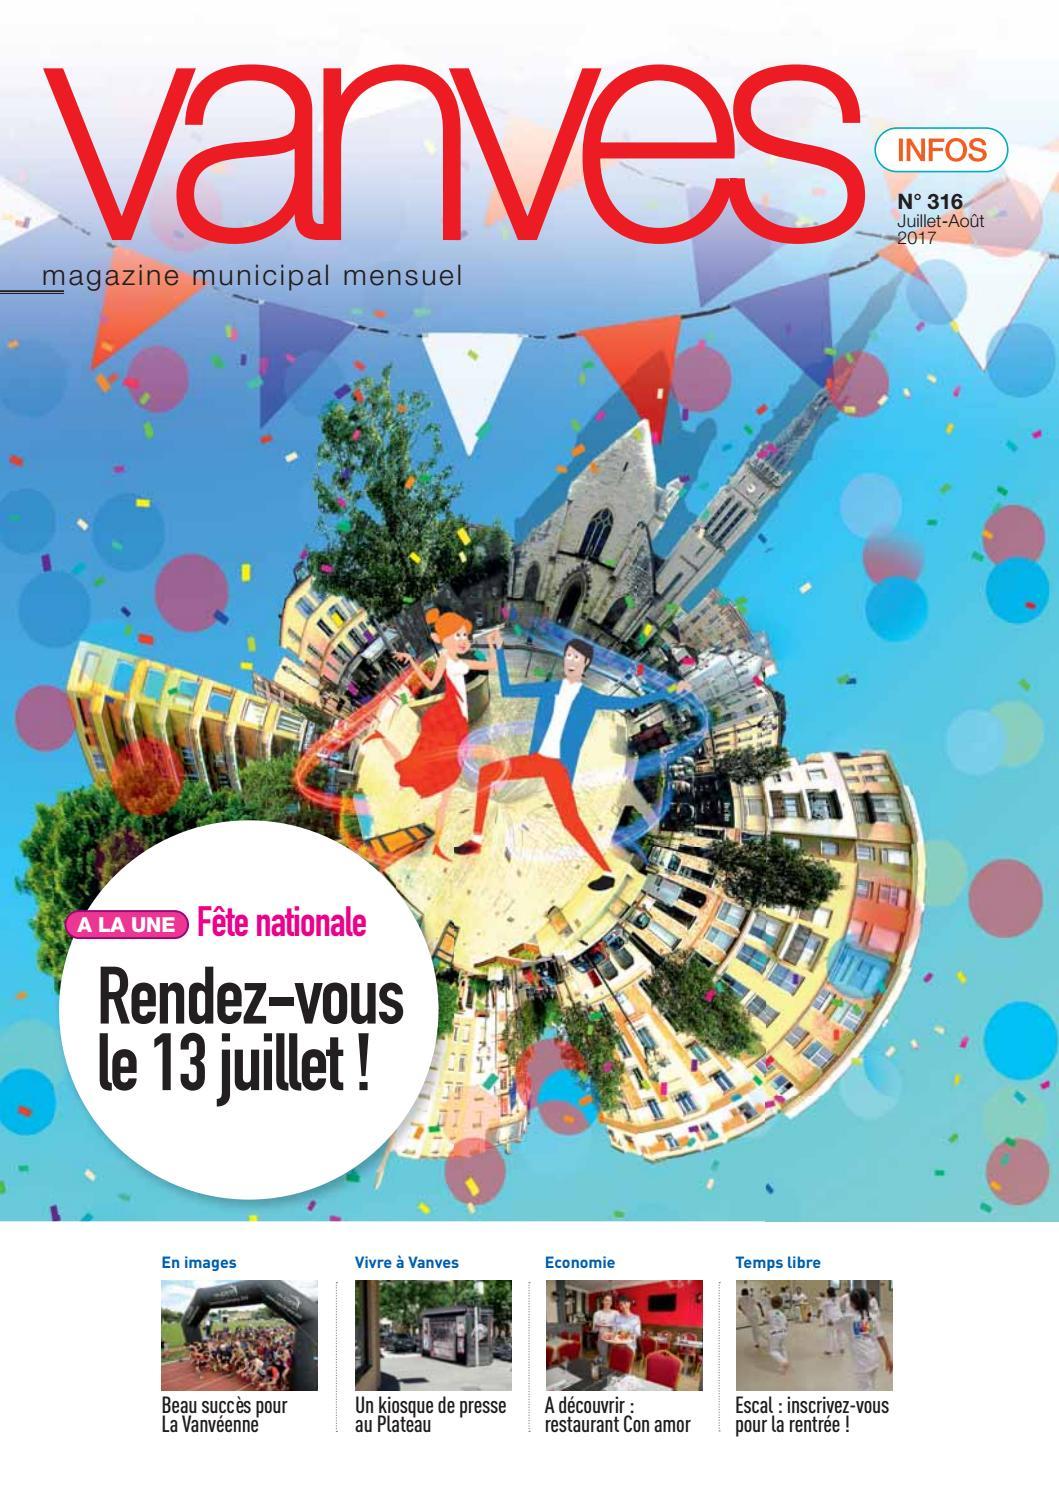 Vanves infos des mois de juillet ao t 2017 by mairie de for Piscine vanves